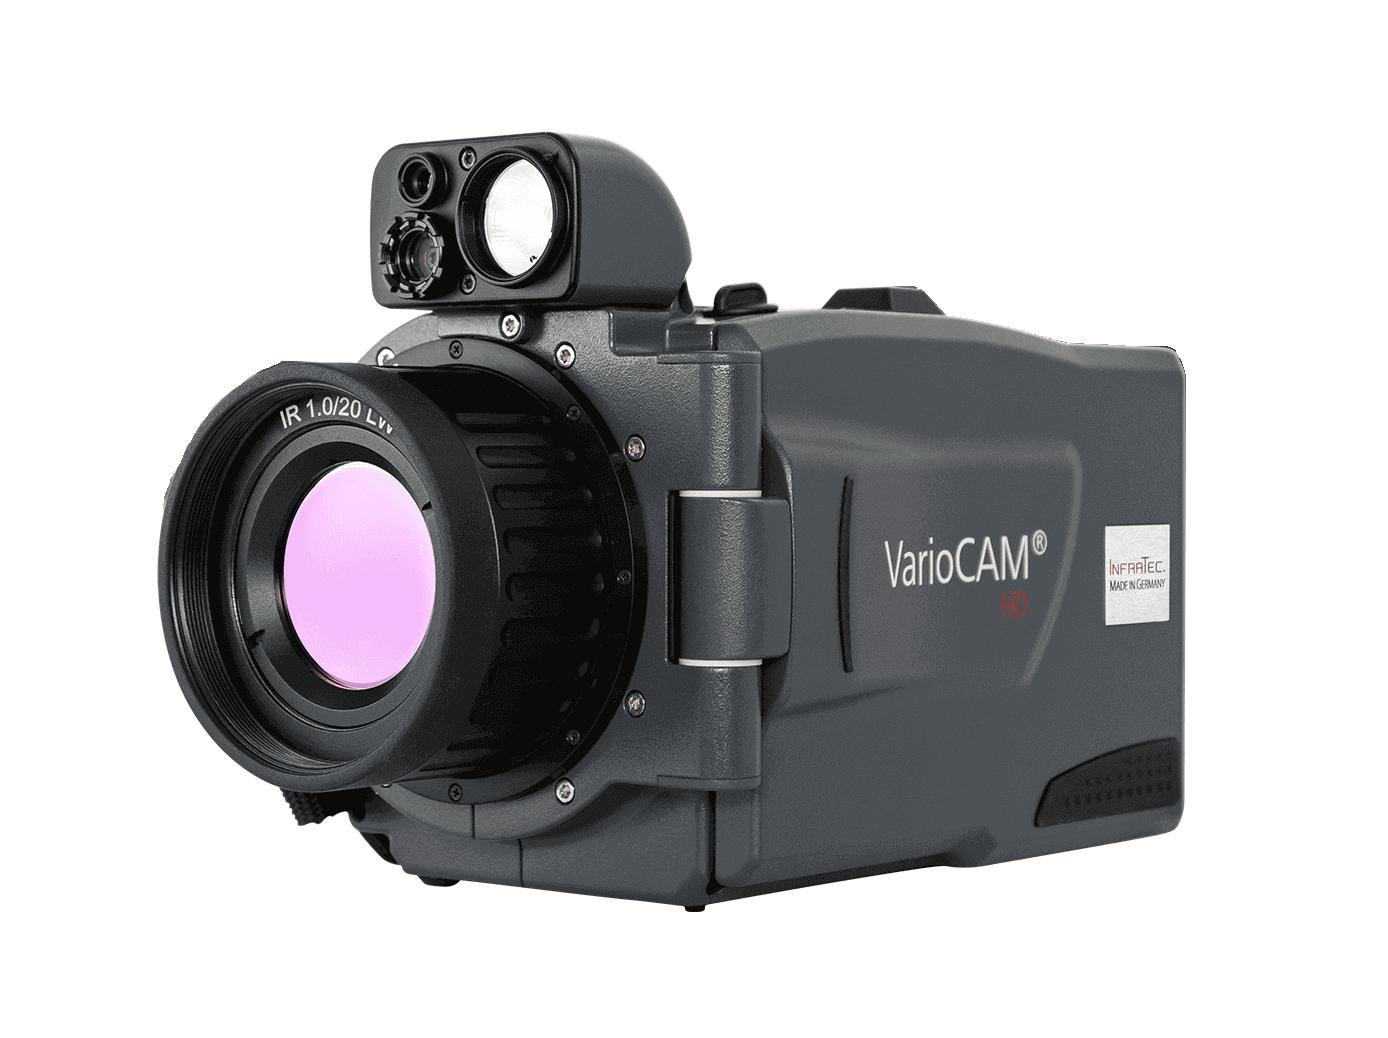 Optics,TestEquipment,Spectroscopy,MotionControl,Imaging,Microscopy,Lasers,Powersupply,CinemaLens,Binocular,Opto- Mechanics,LabAccessories,Camera,Lenses,Prism,Beamsplitter,Windows,Diffuser,Polarizer,Mirrors,Domes,Spherometer, Infrared ,IR , Ultraviolet ,UV ,Viewers, Spectrometer, Optical , Turnkey Solutions